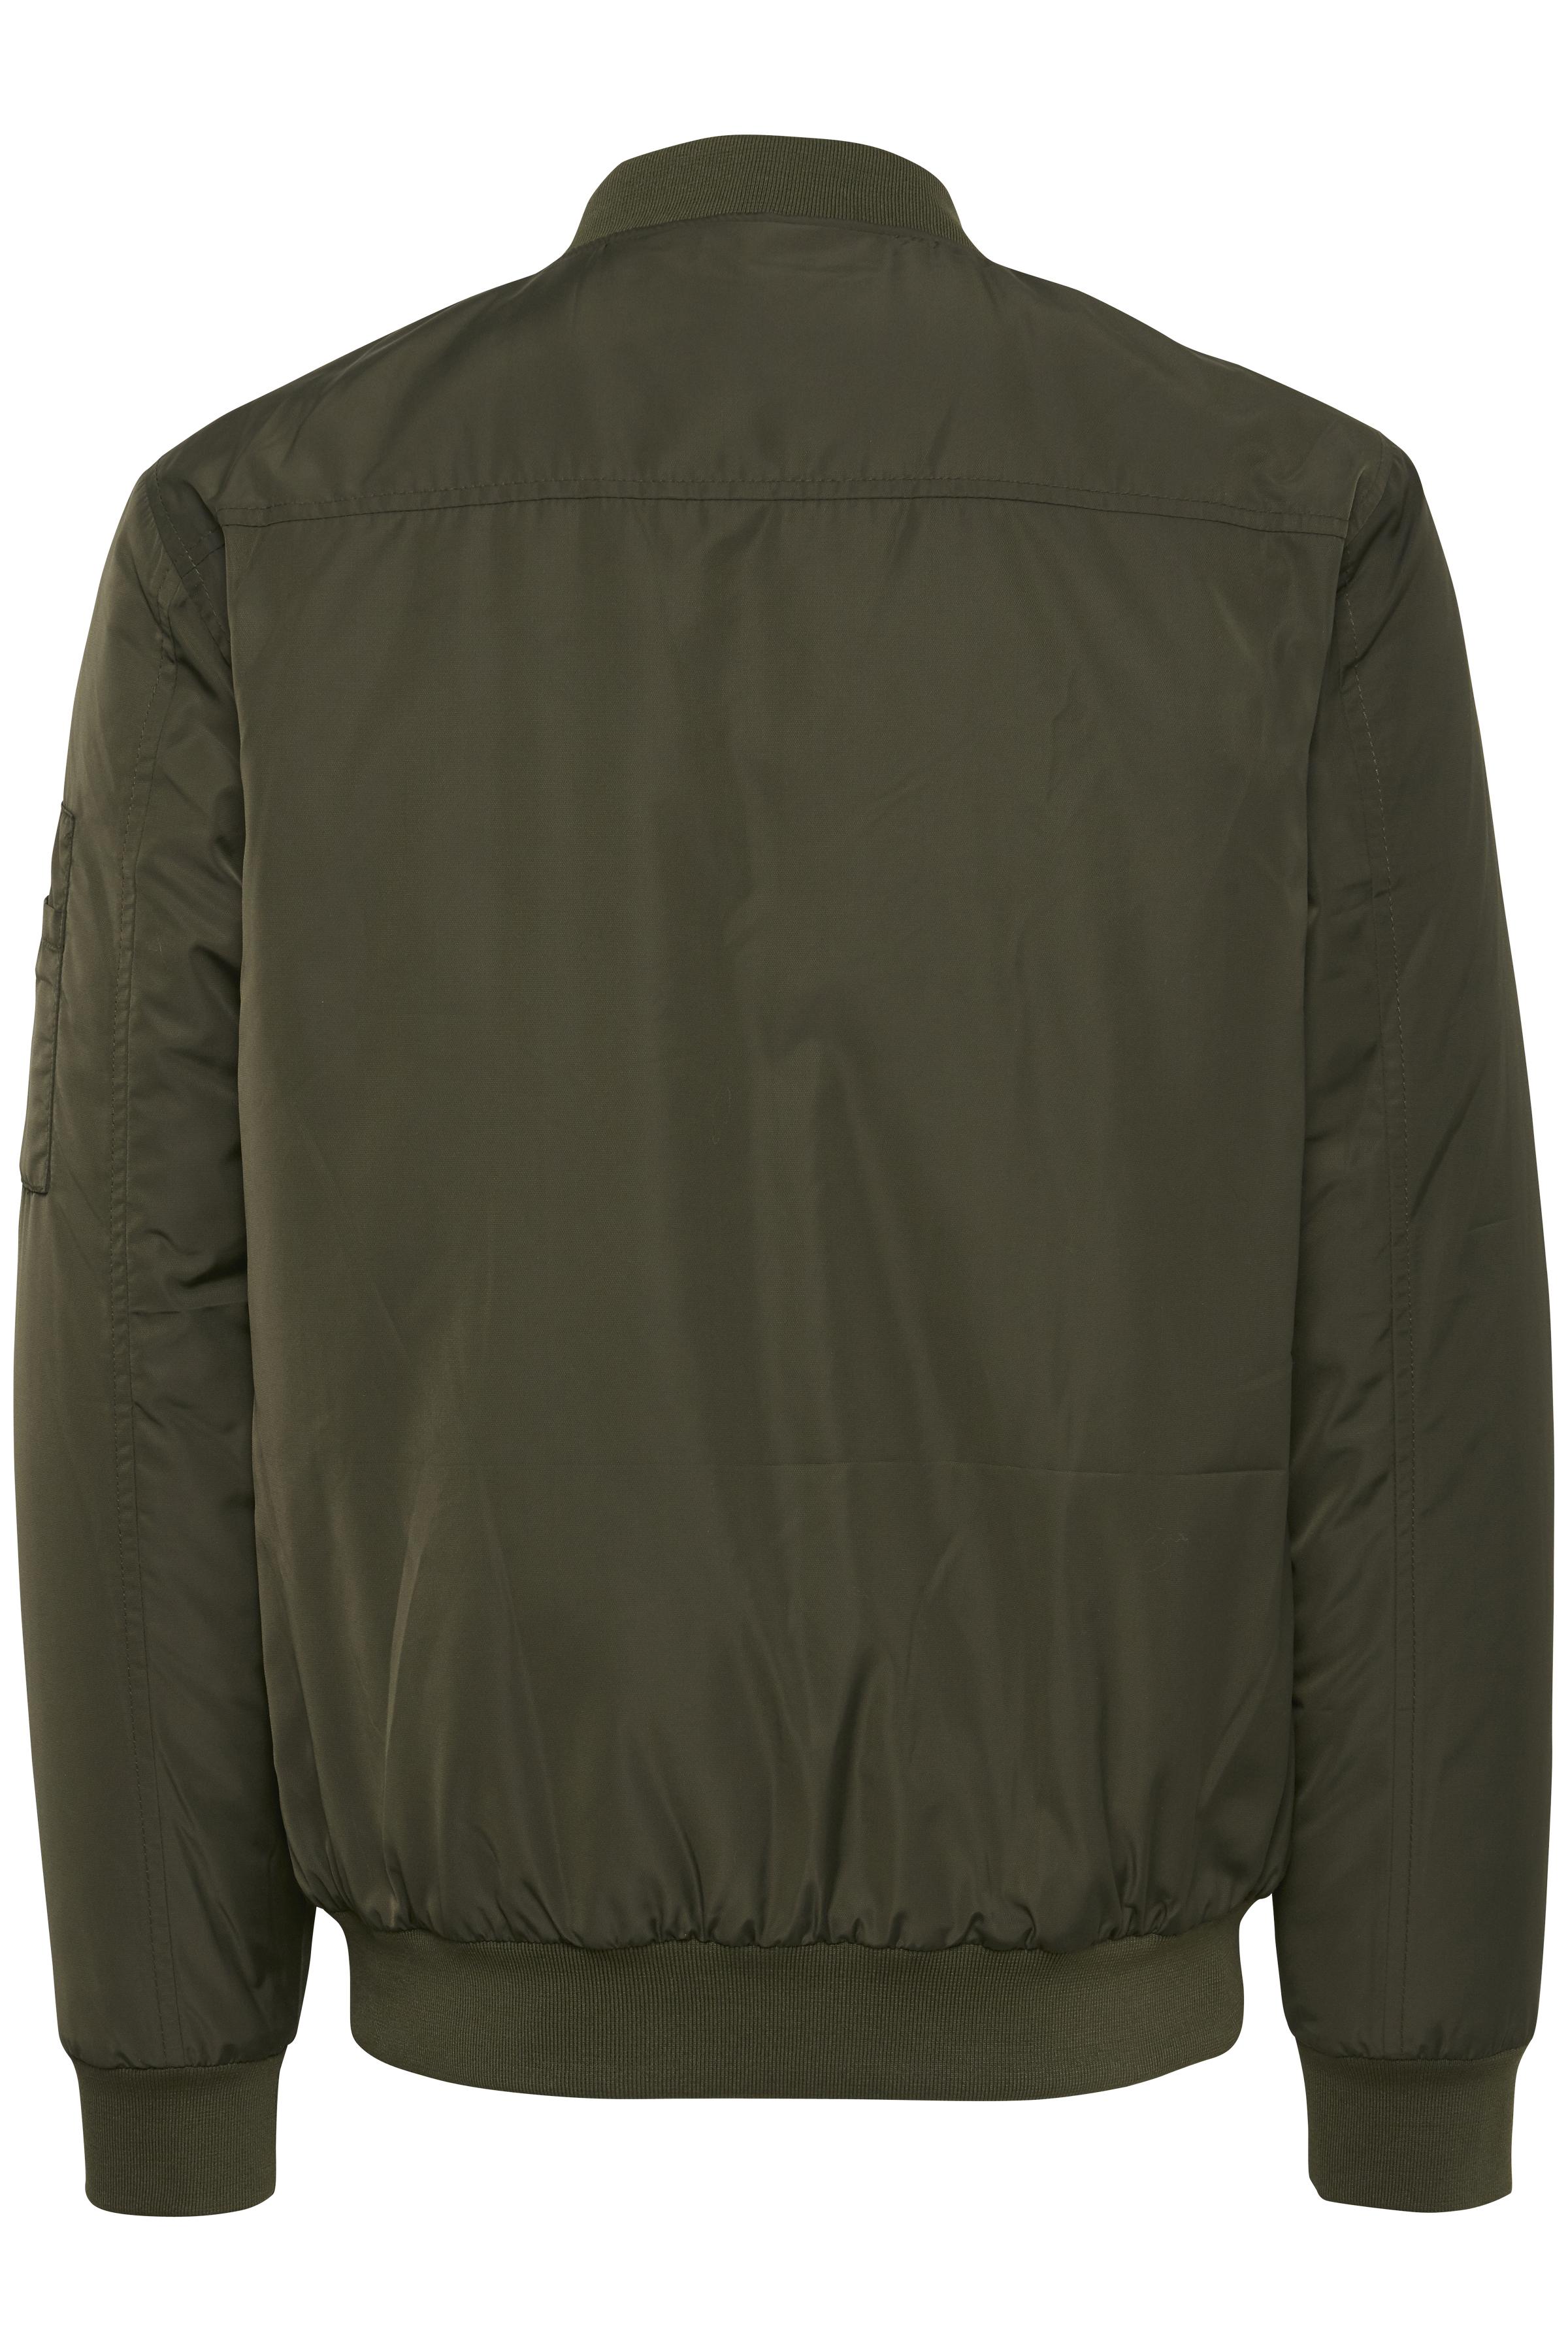 Forest Night Green Outerwear fra Blend He – Køb Forest Night Green Outerwear fra str. S-XXL her